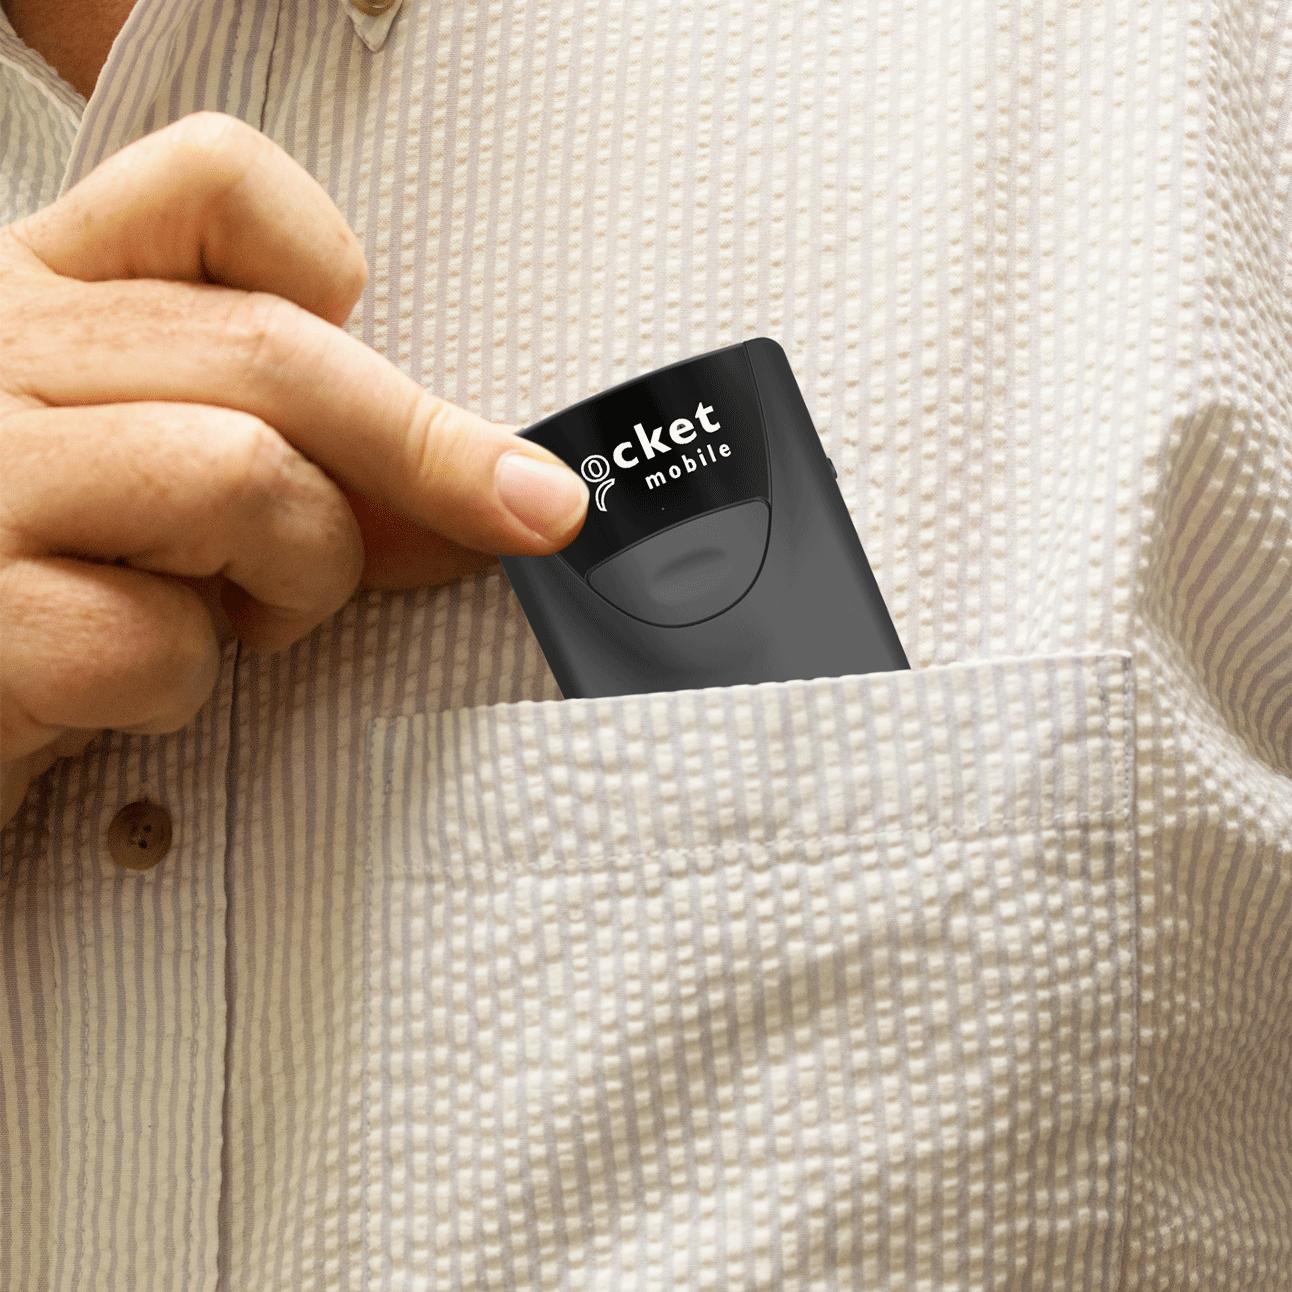 SocketScan-800series-pocket